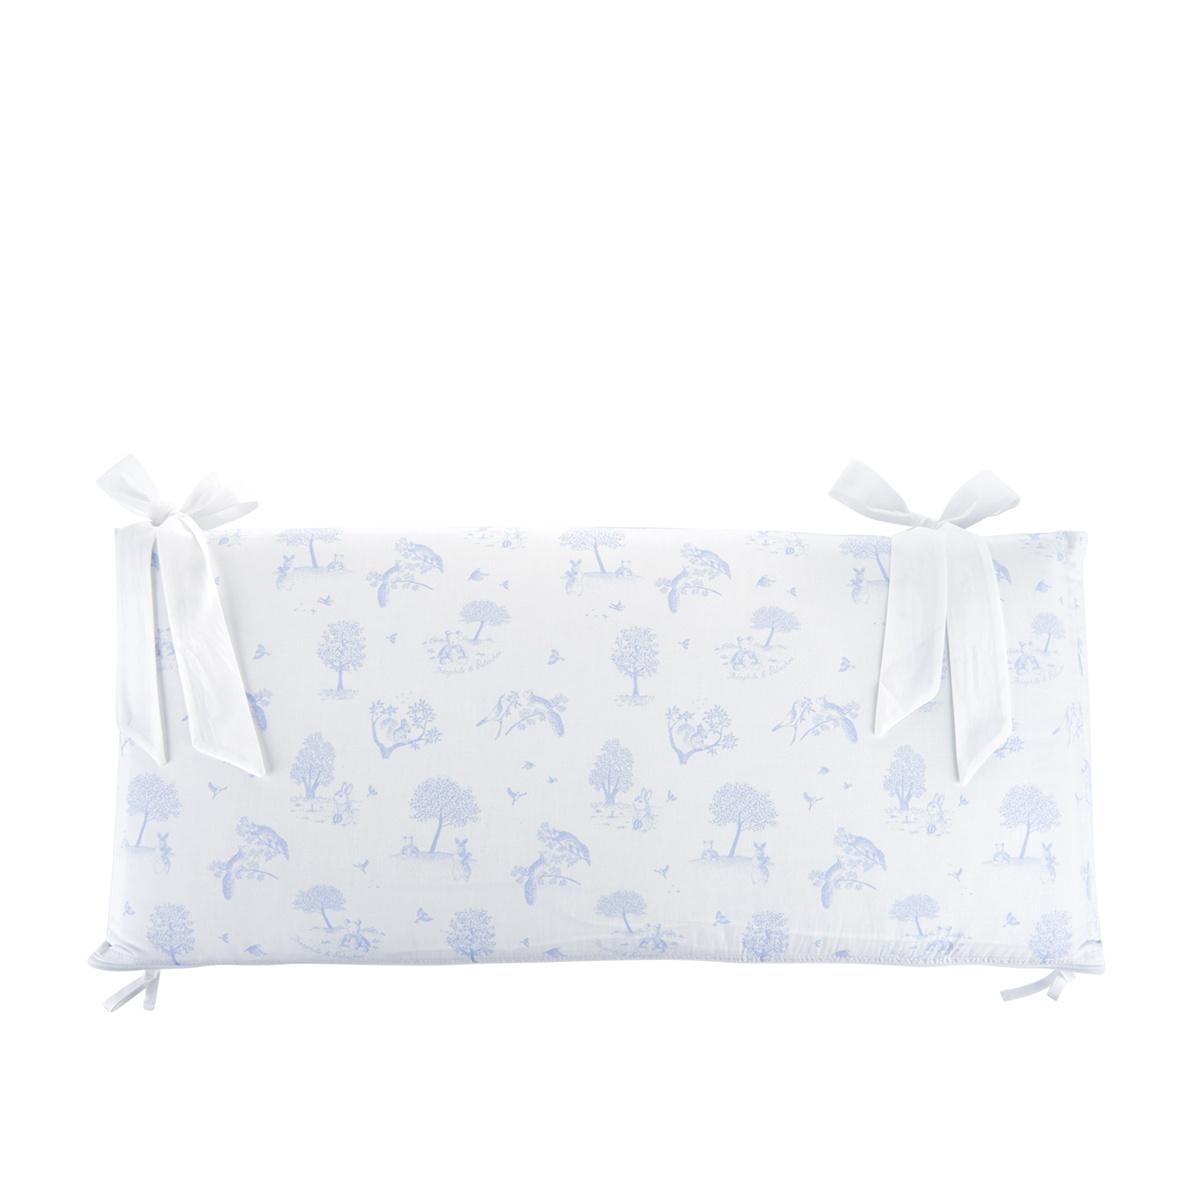 Bedomranding  70cm  Sweet Blue Theophile & Patachou-1